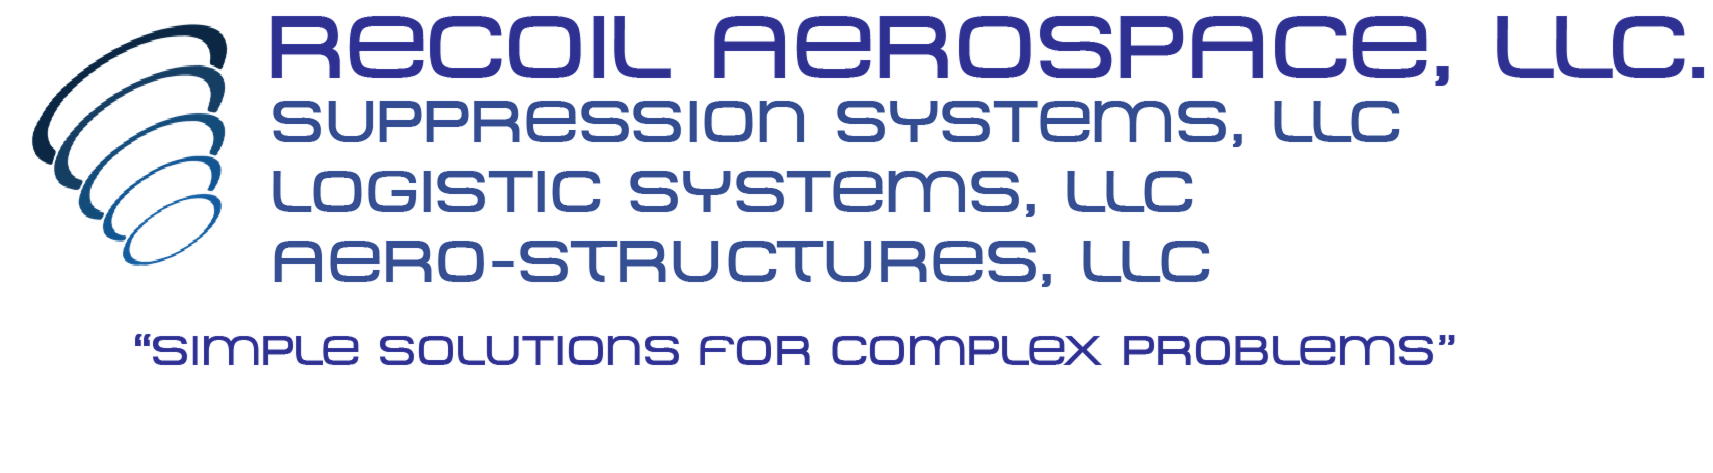 Recoil Aerospace